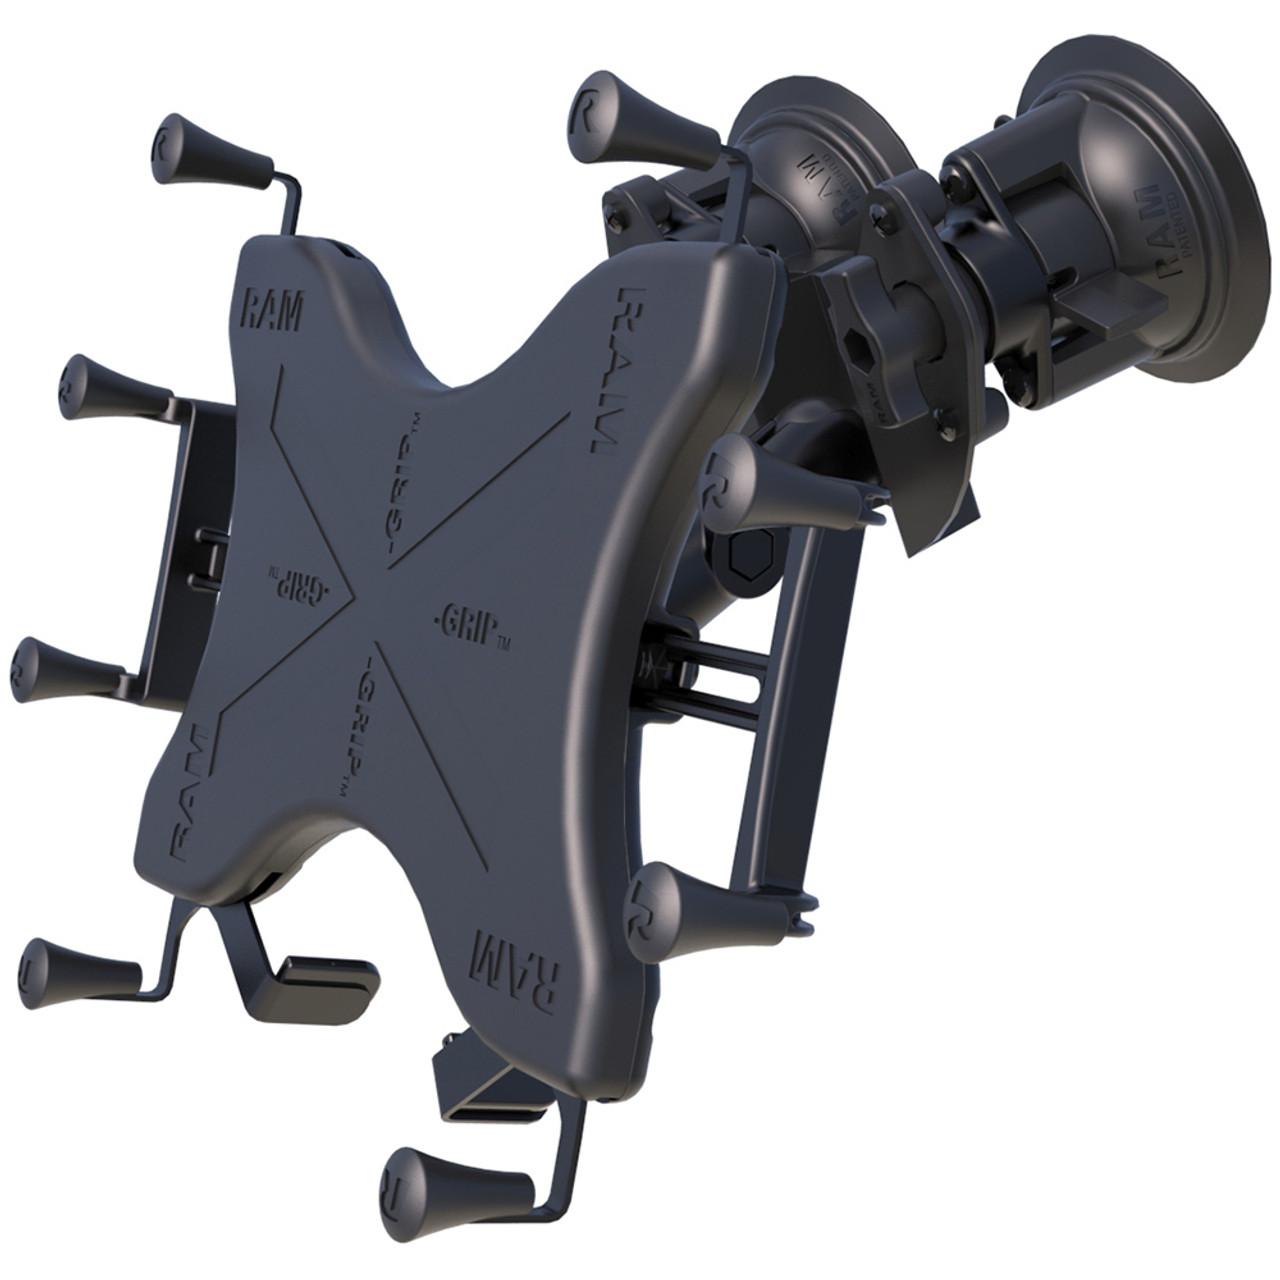 "RAM Mount Dual Articulating Suction Cup w\/Medium Length Double Socket Arm  Universal X-Grip Cradle f\/12"" Large Tablets [RAM-B-189-PIV1-UN11U]"